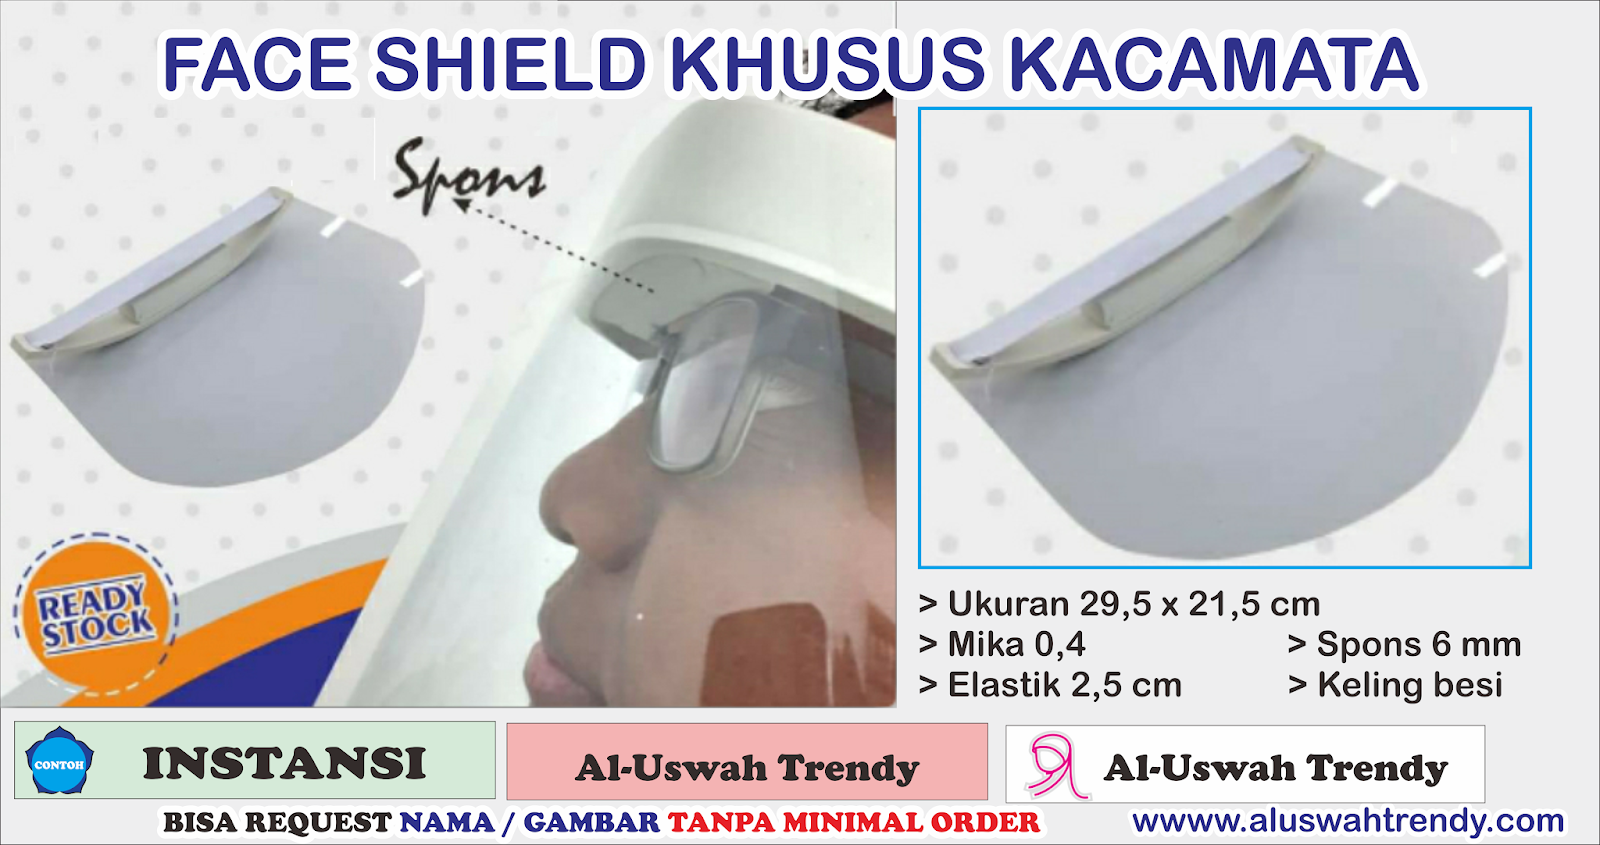 Face Shield Khusus Orang Ber kacamata